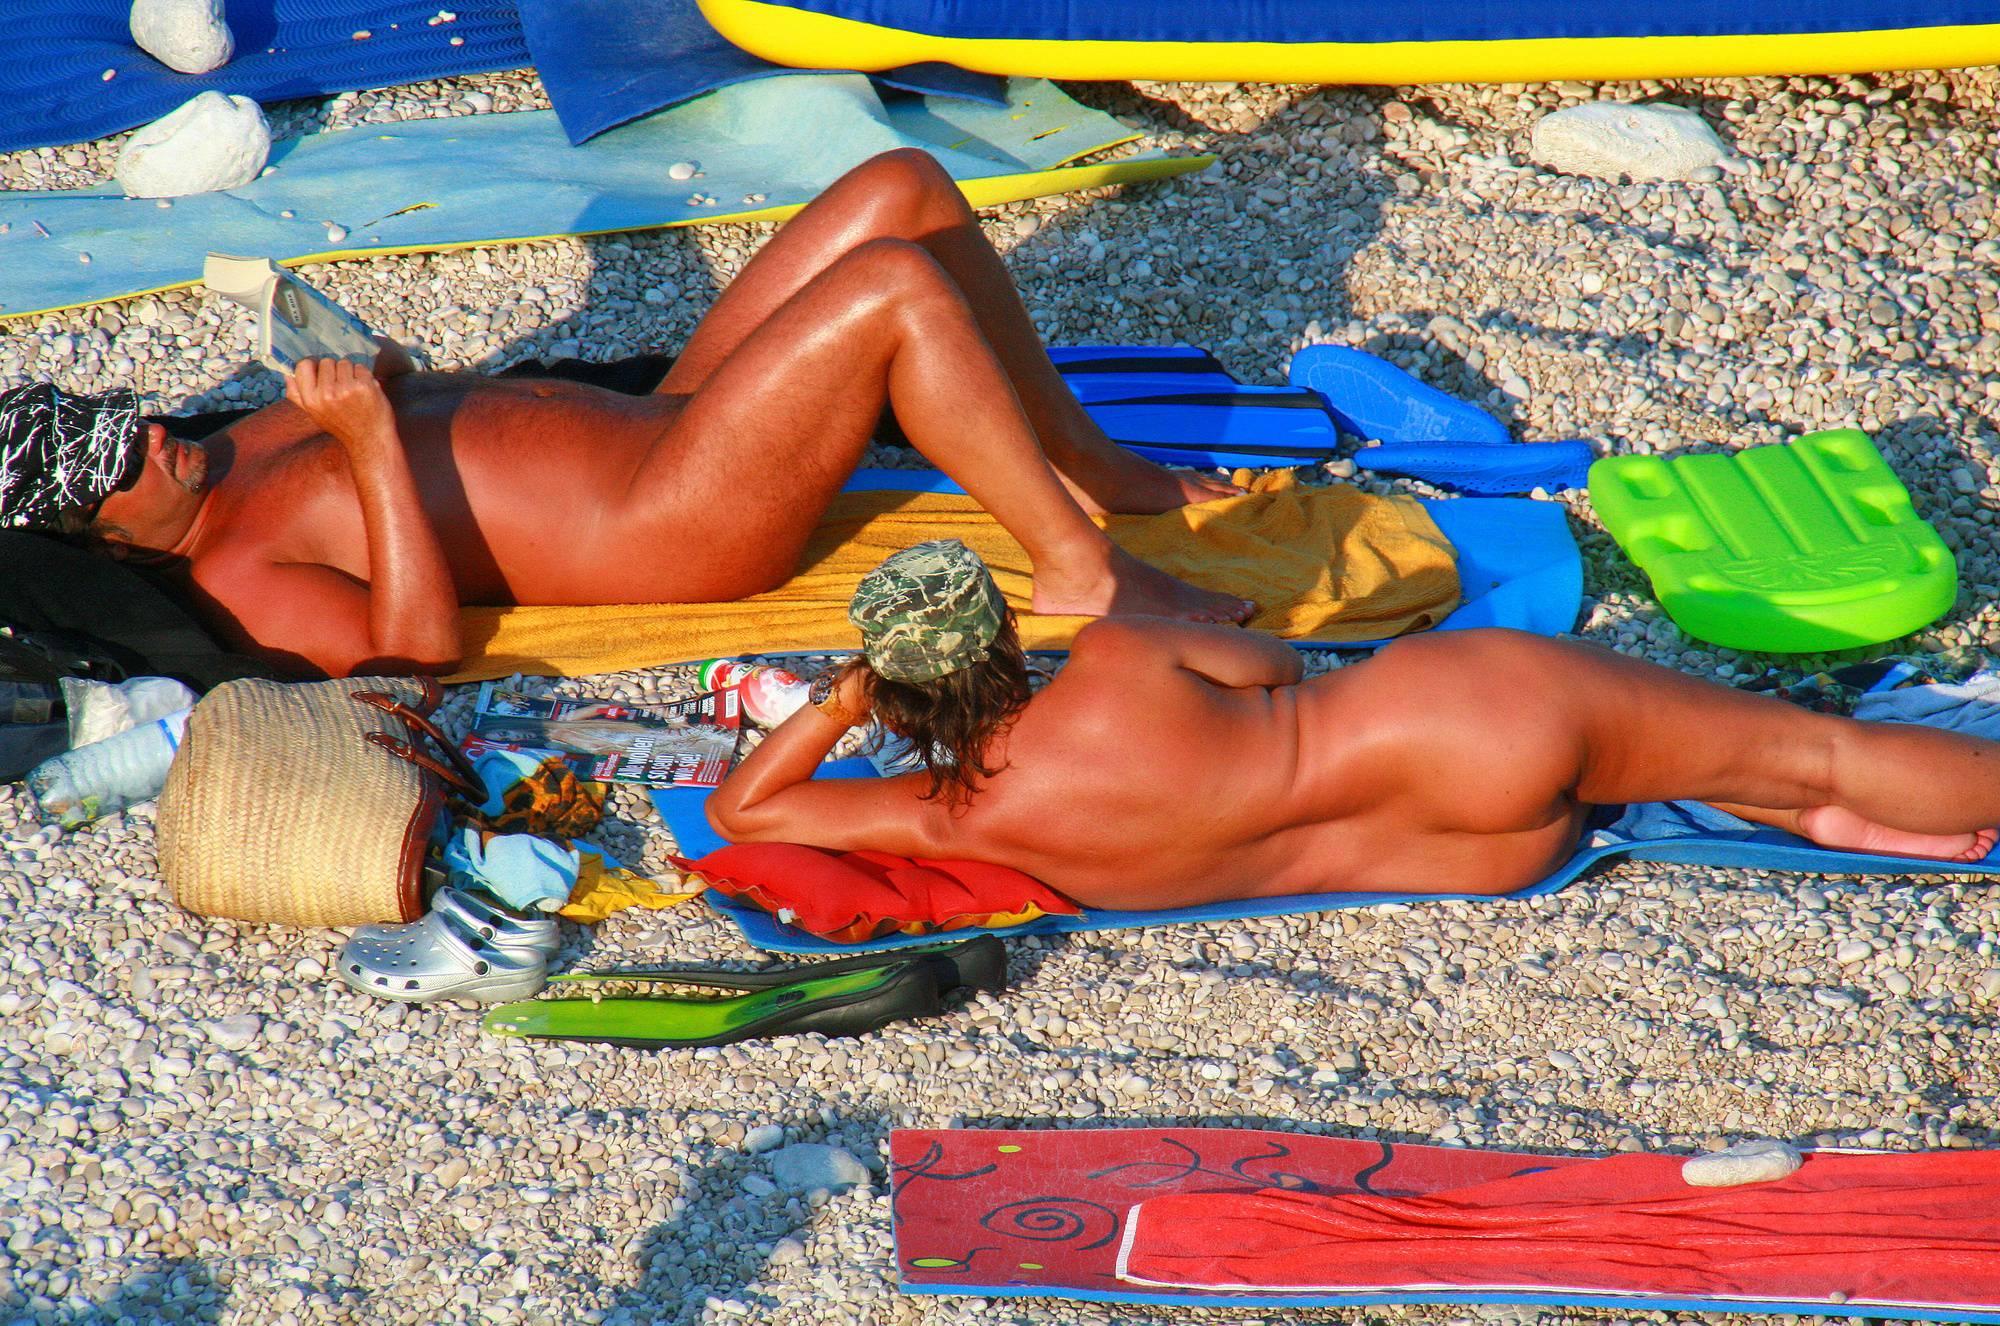 Nudist Pictures Ula FKK Beach Camping - 1